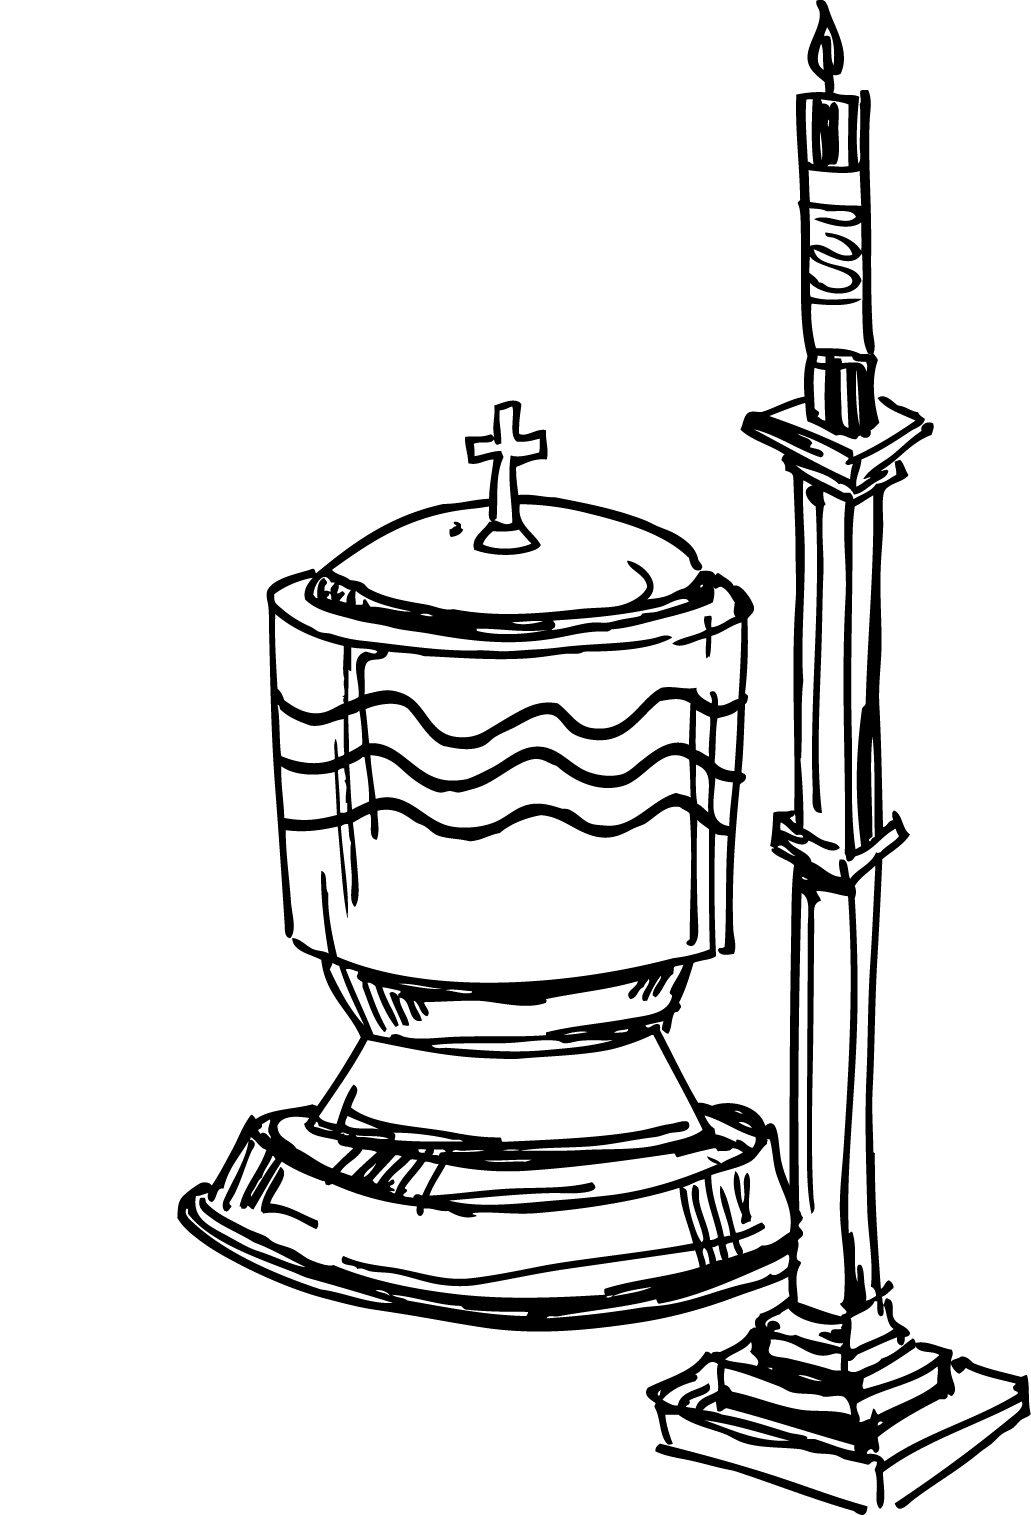 Catholic Baptism Cross Clipart Free Clipart Images 2 Image